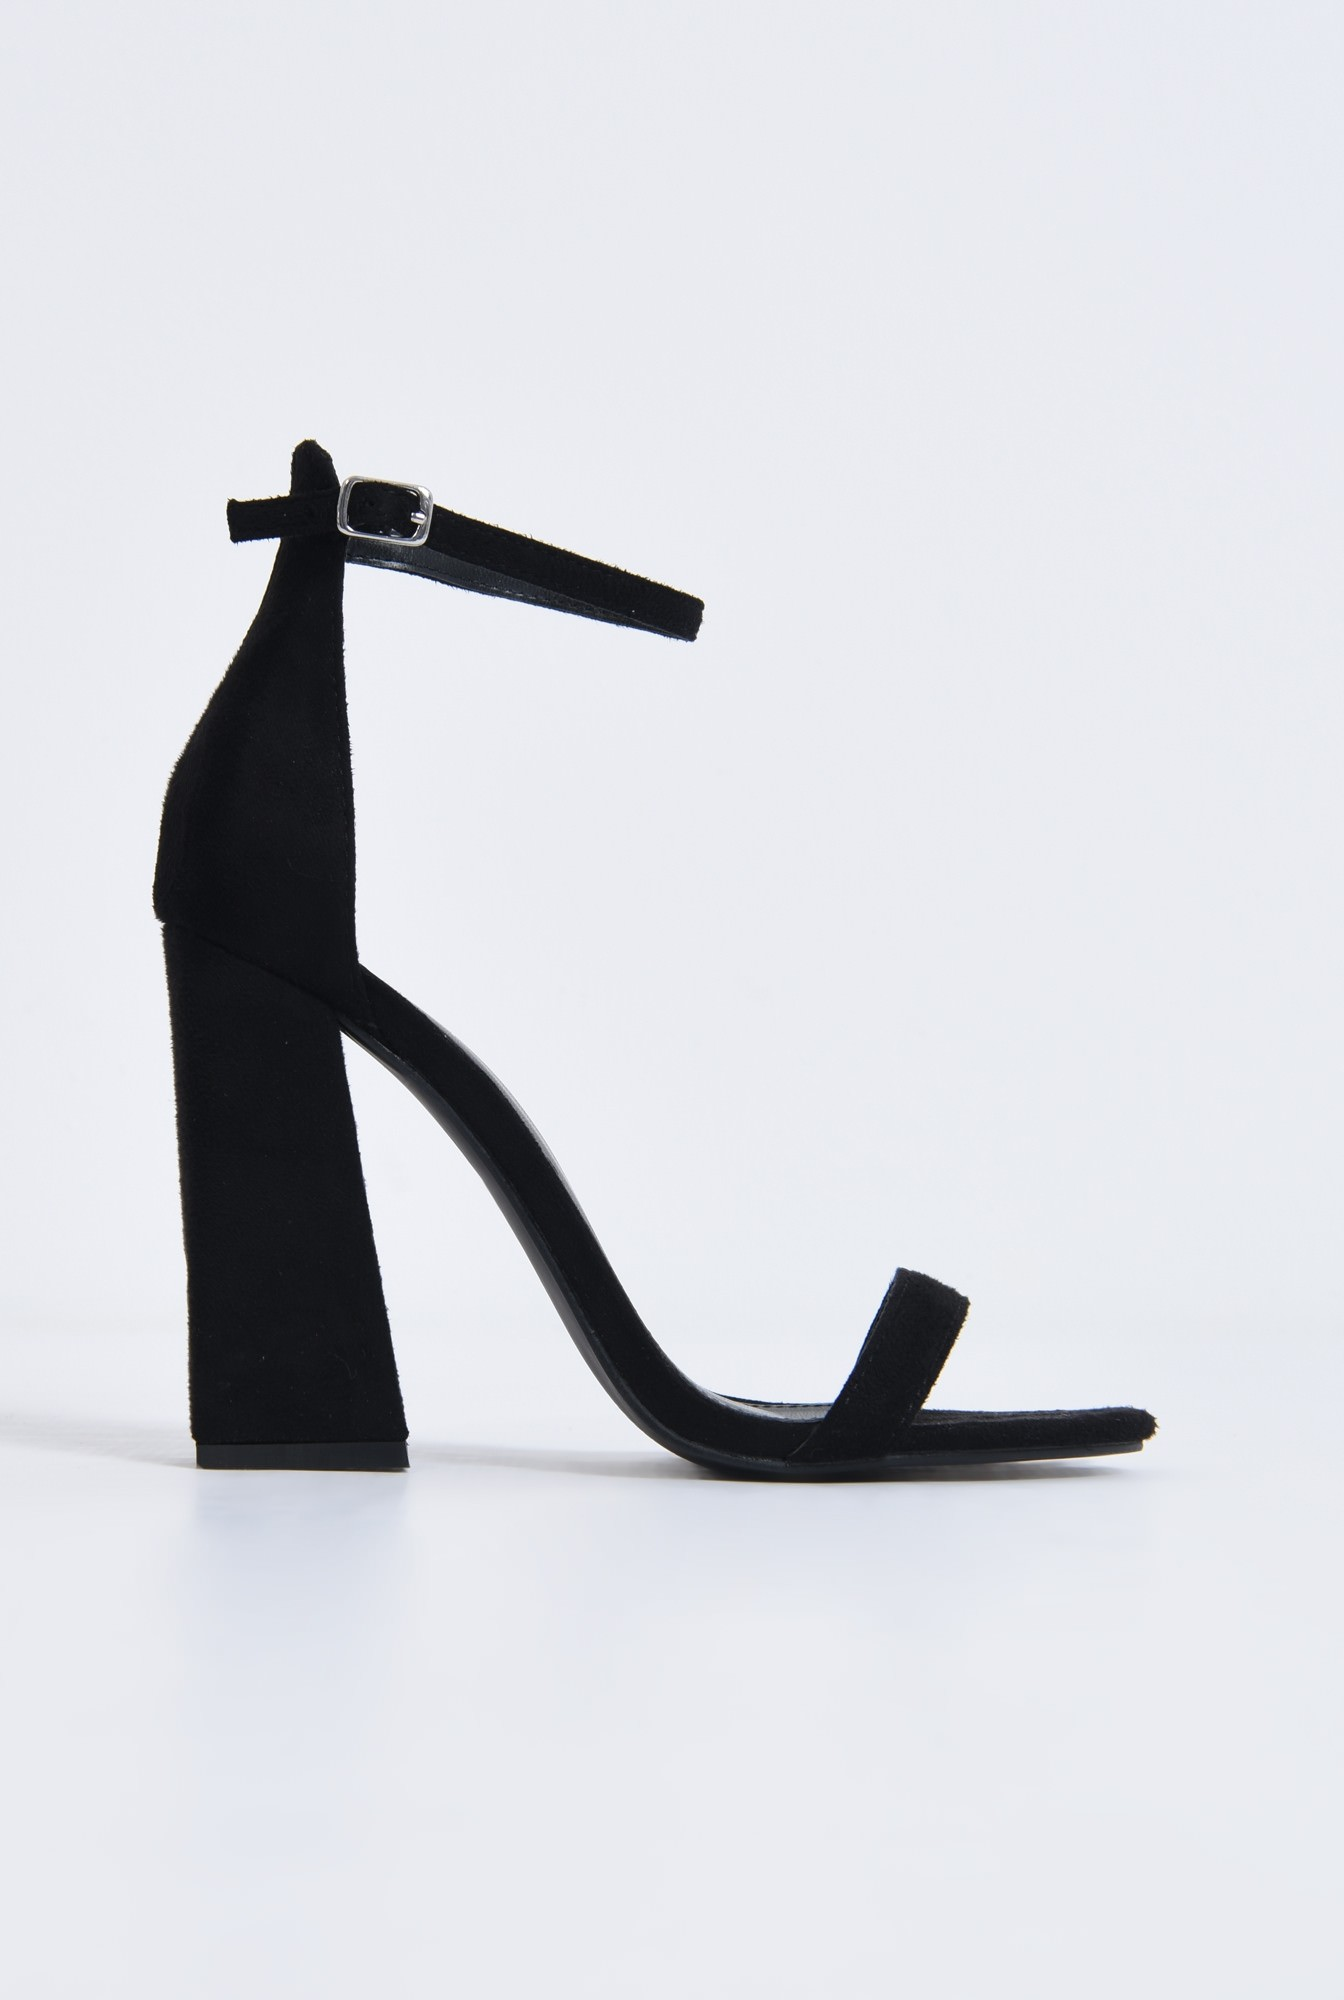 0 - sandale toc inalt, piele ecologica